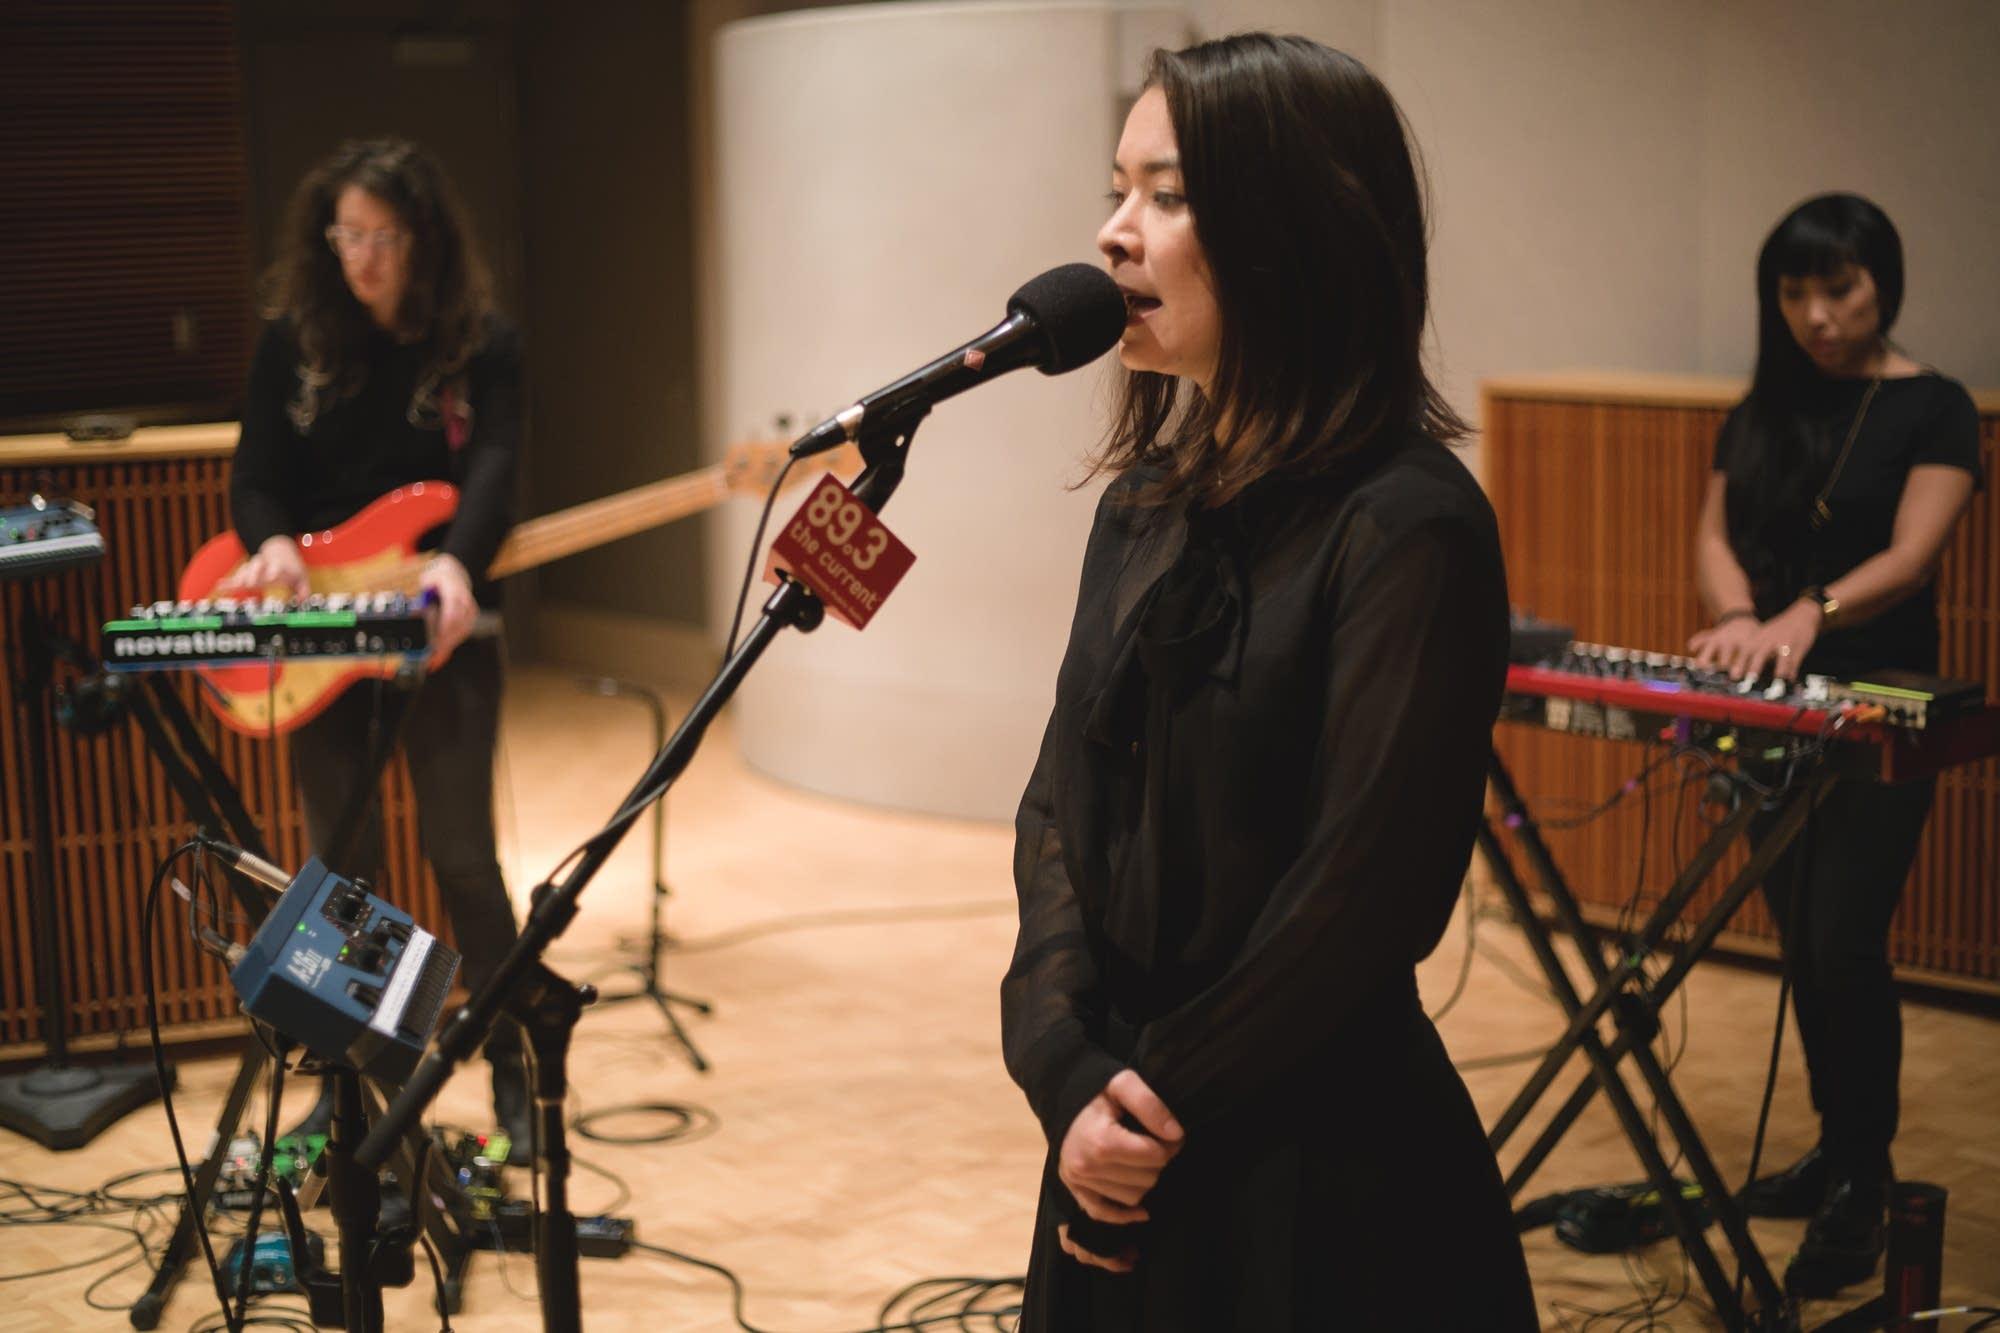 Mitski performs in The Current studio